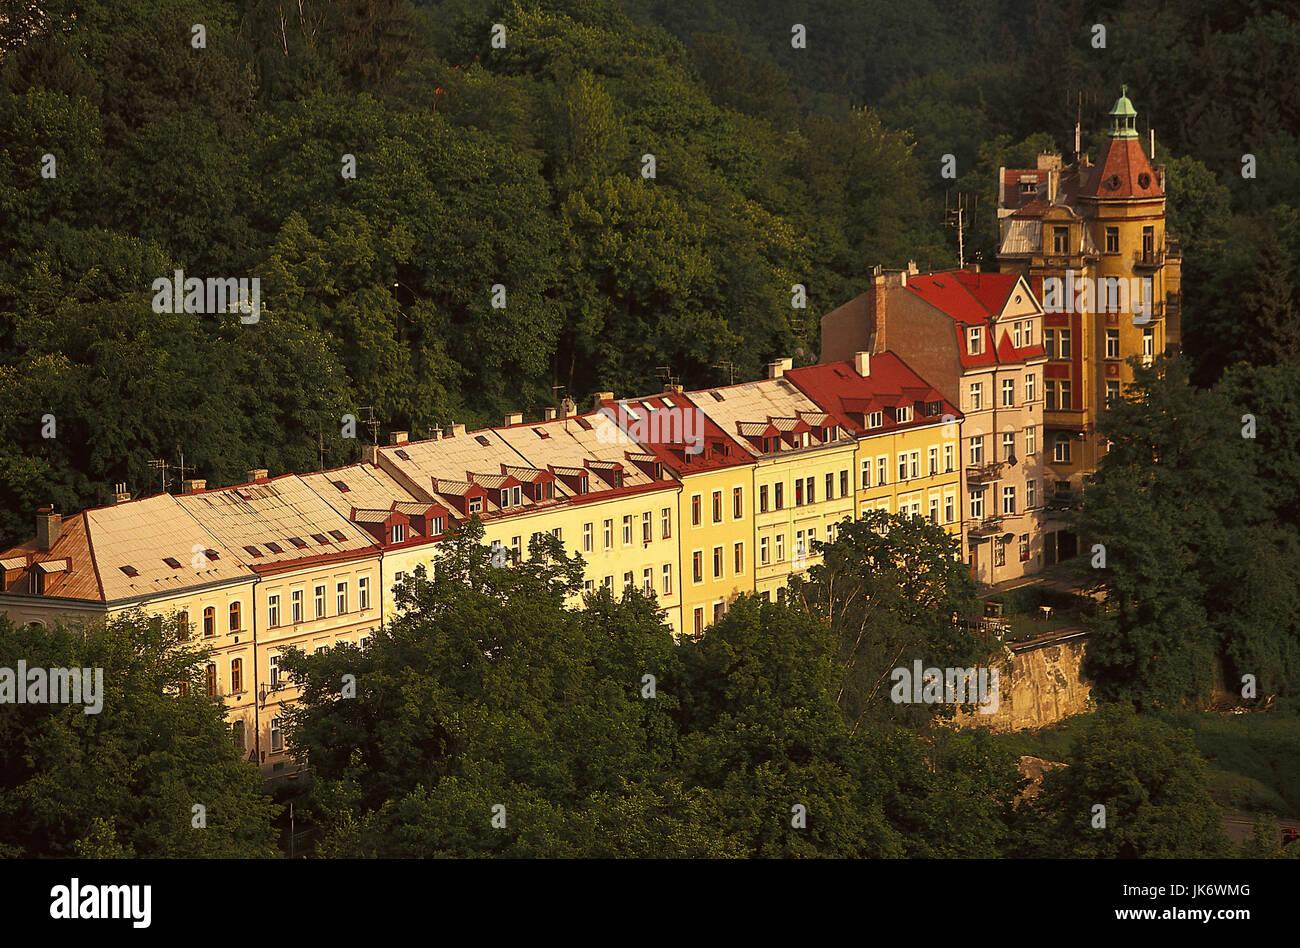 Tschechische Republik, Westböhmen,  Karlovy Vary, Stadtansicht  Europa, Osteuropa, Tschechien, Ceská Republika, - Stock Image